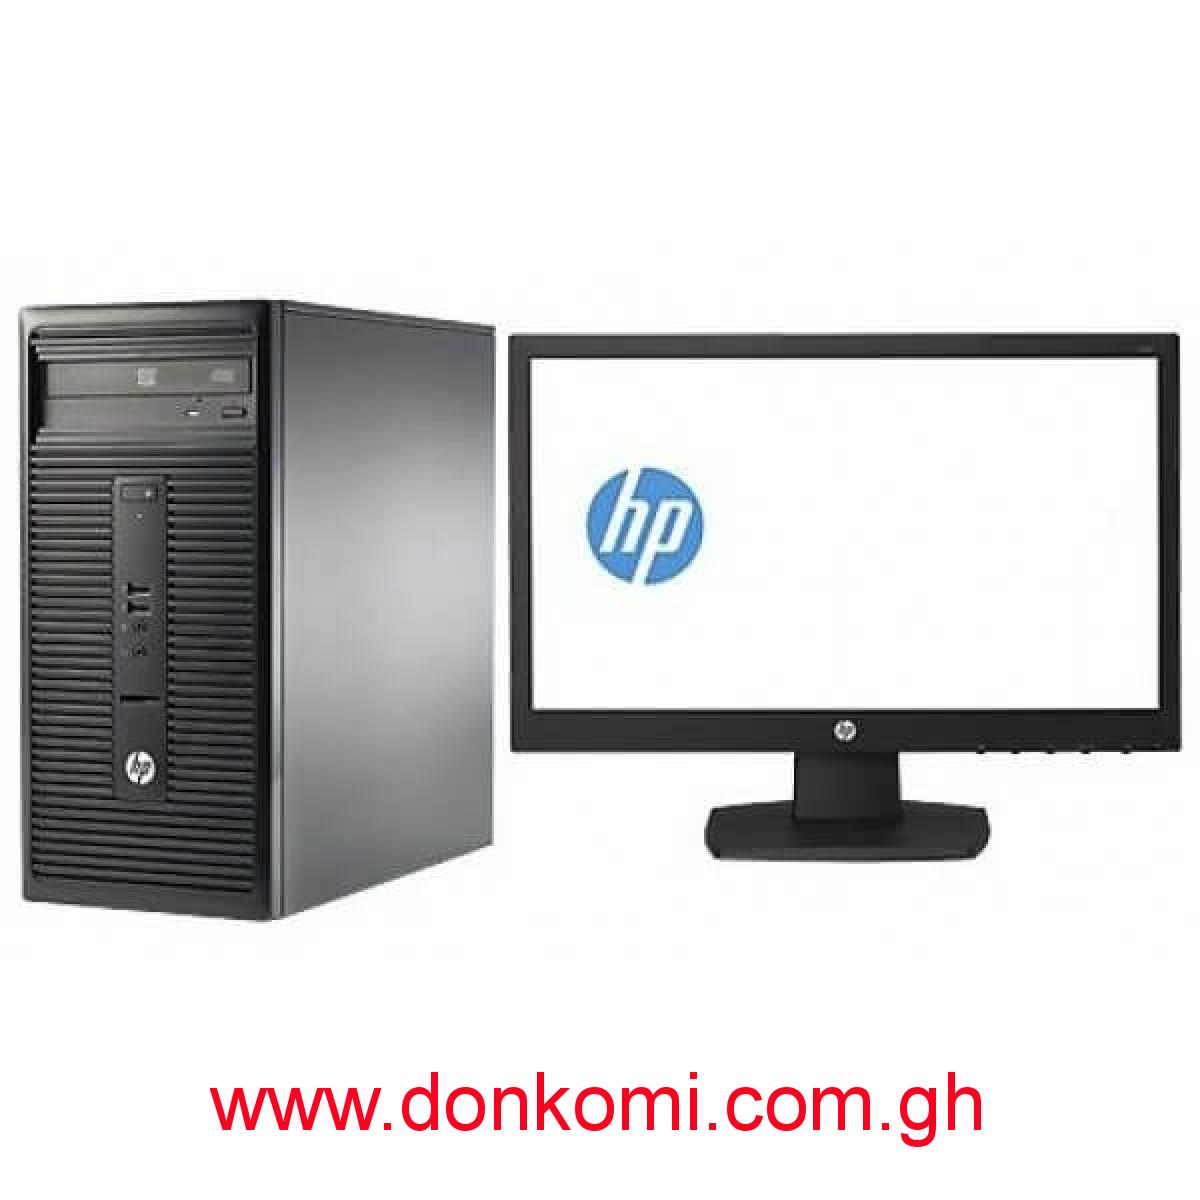 HP 280G1 I3 DESKTOP